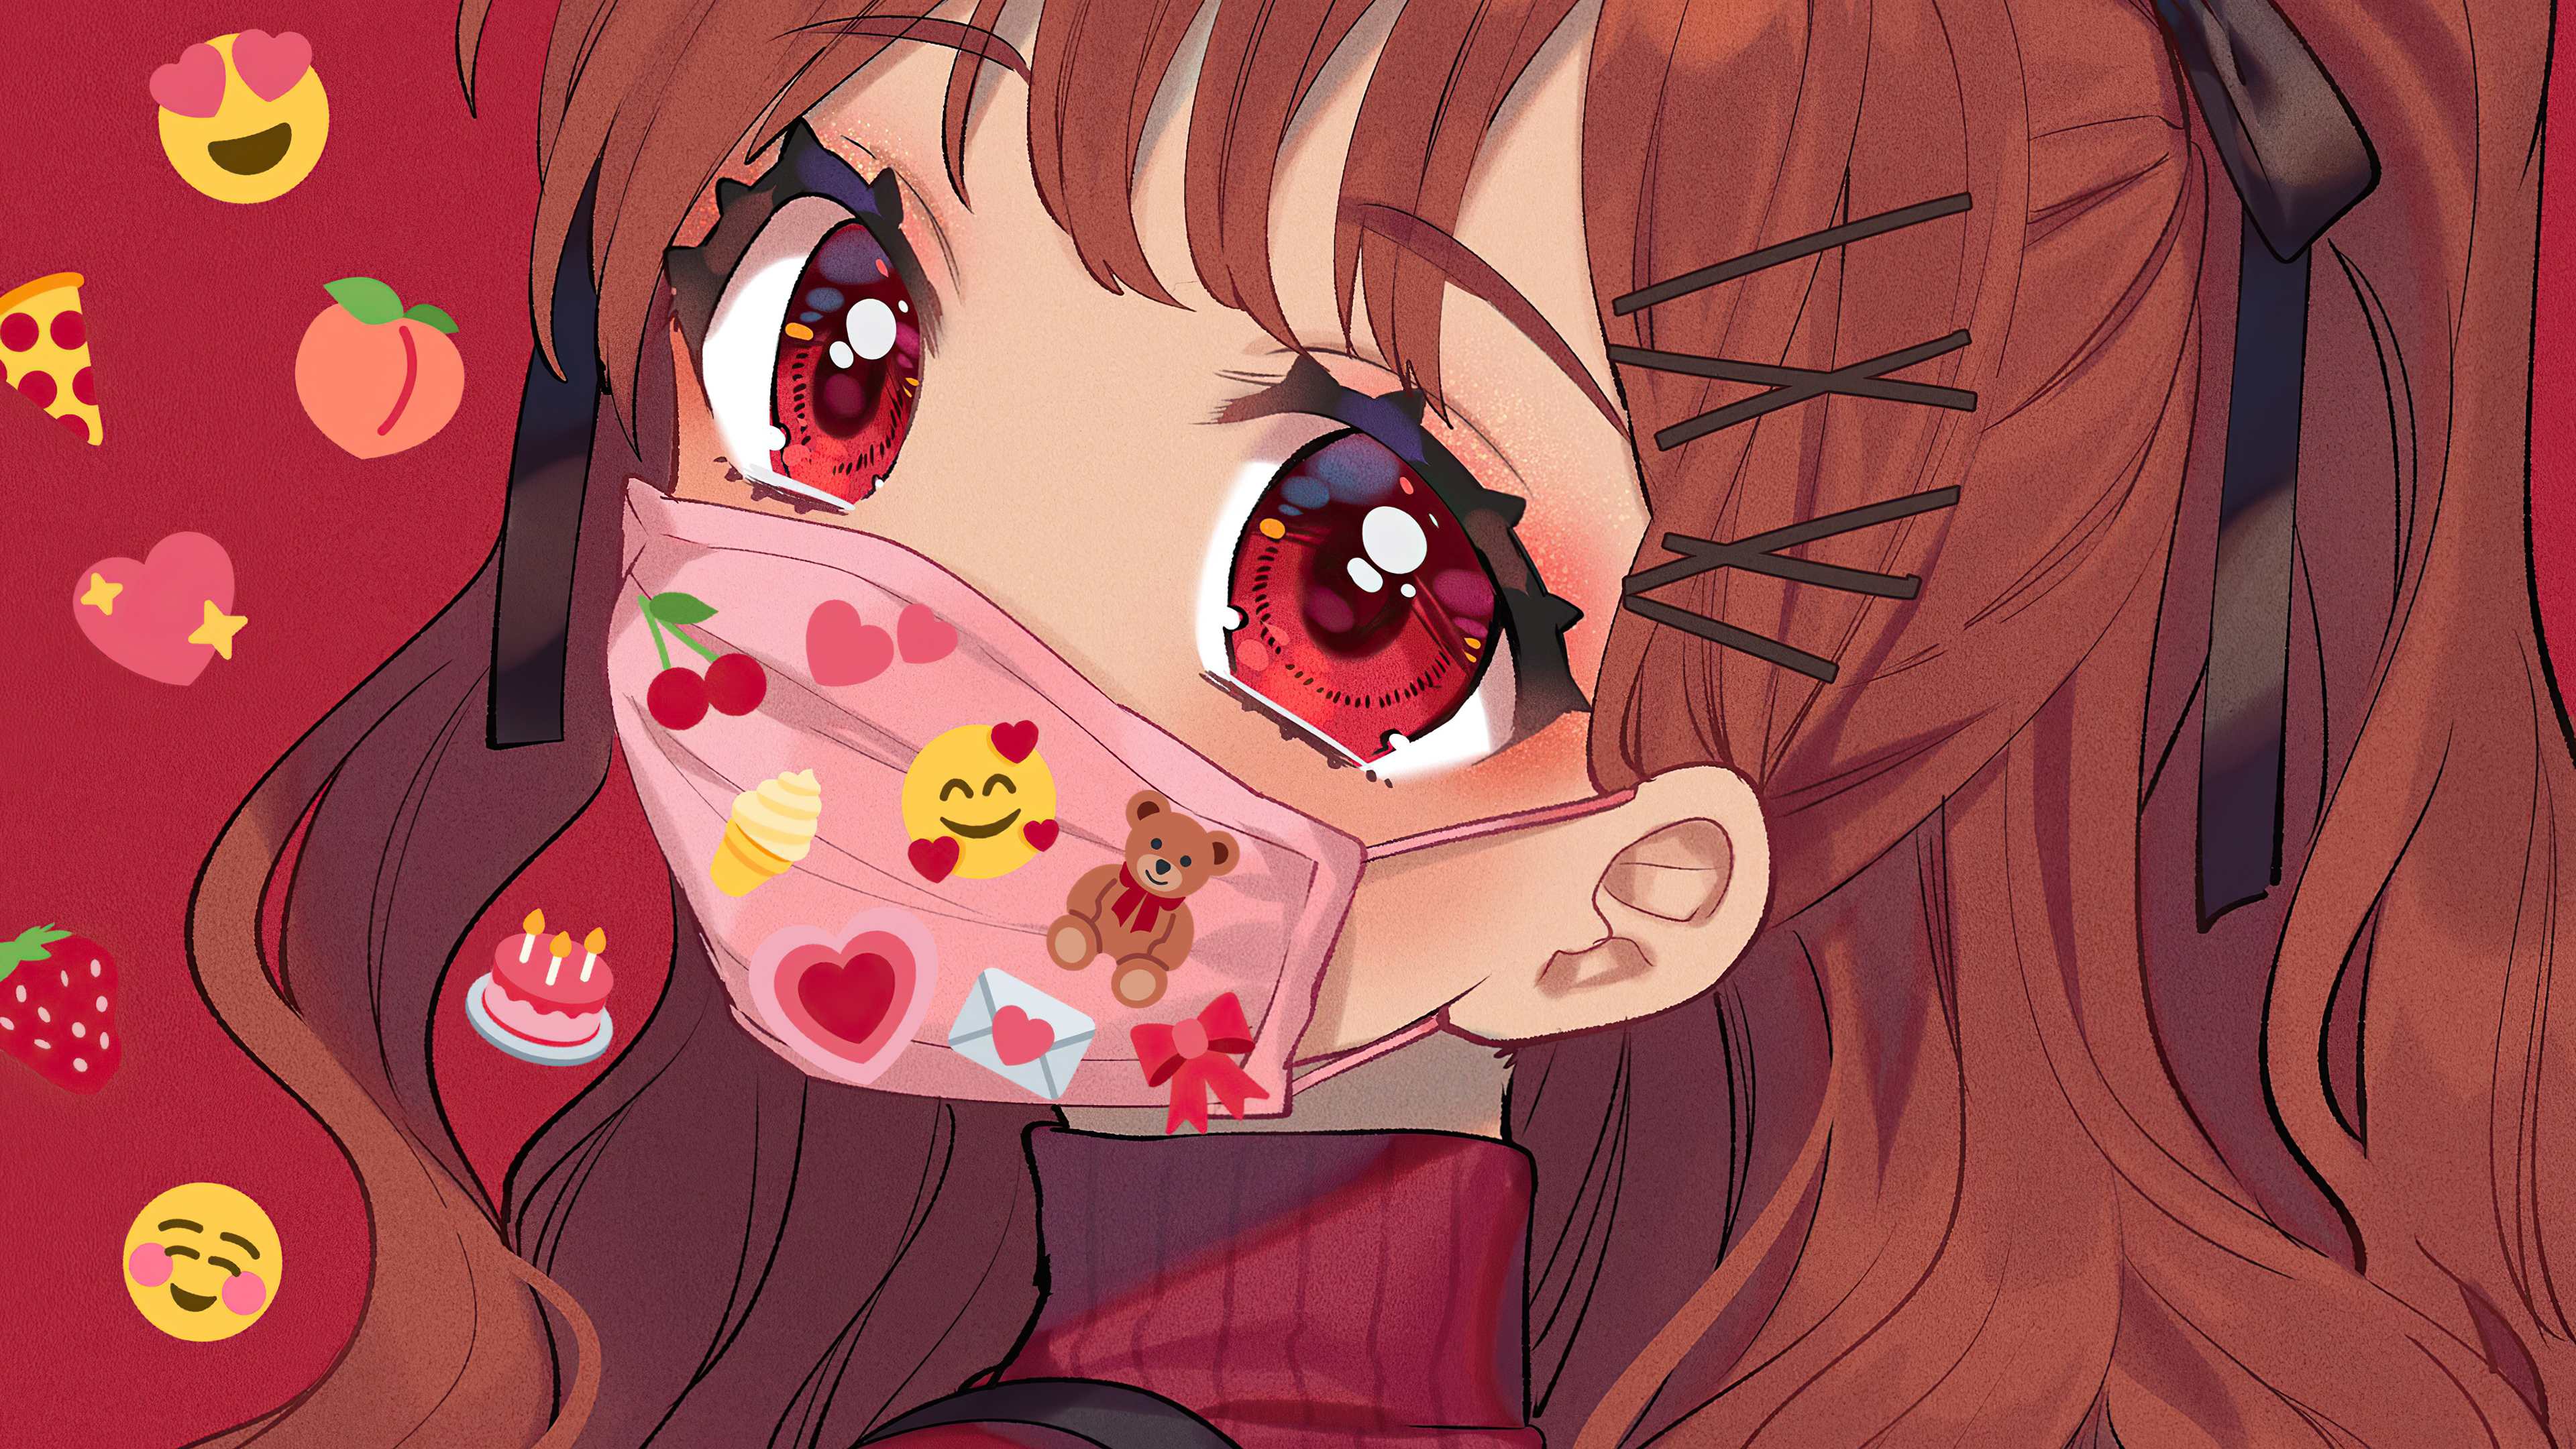 2560x1080 Anime Girl Big Eyes Tattoo Mask 2560x1080 ...